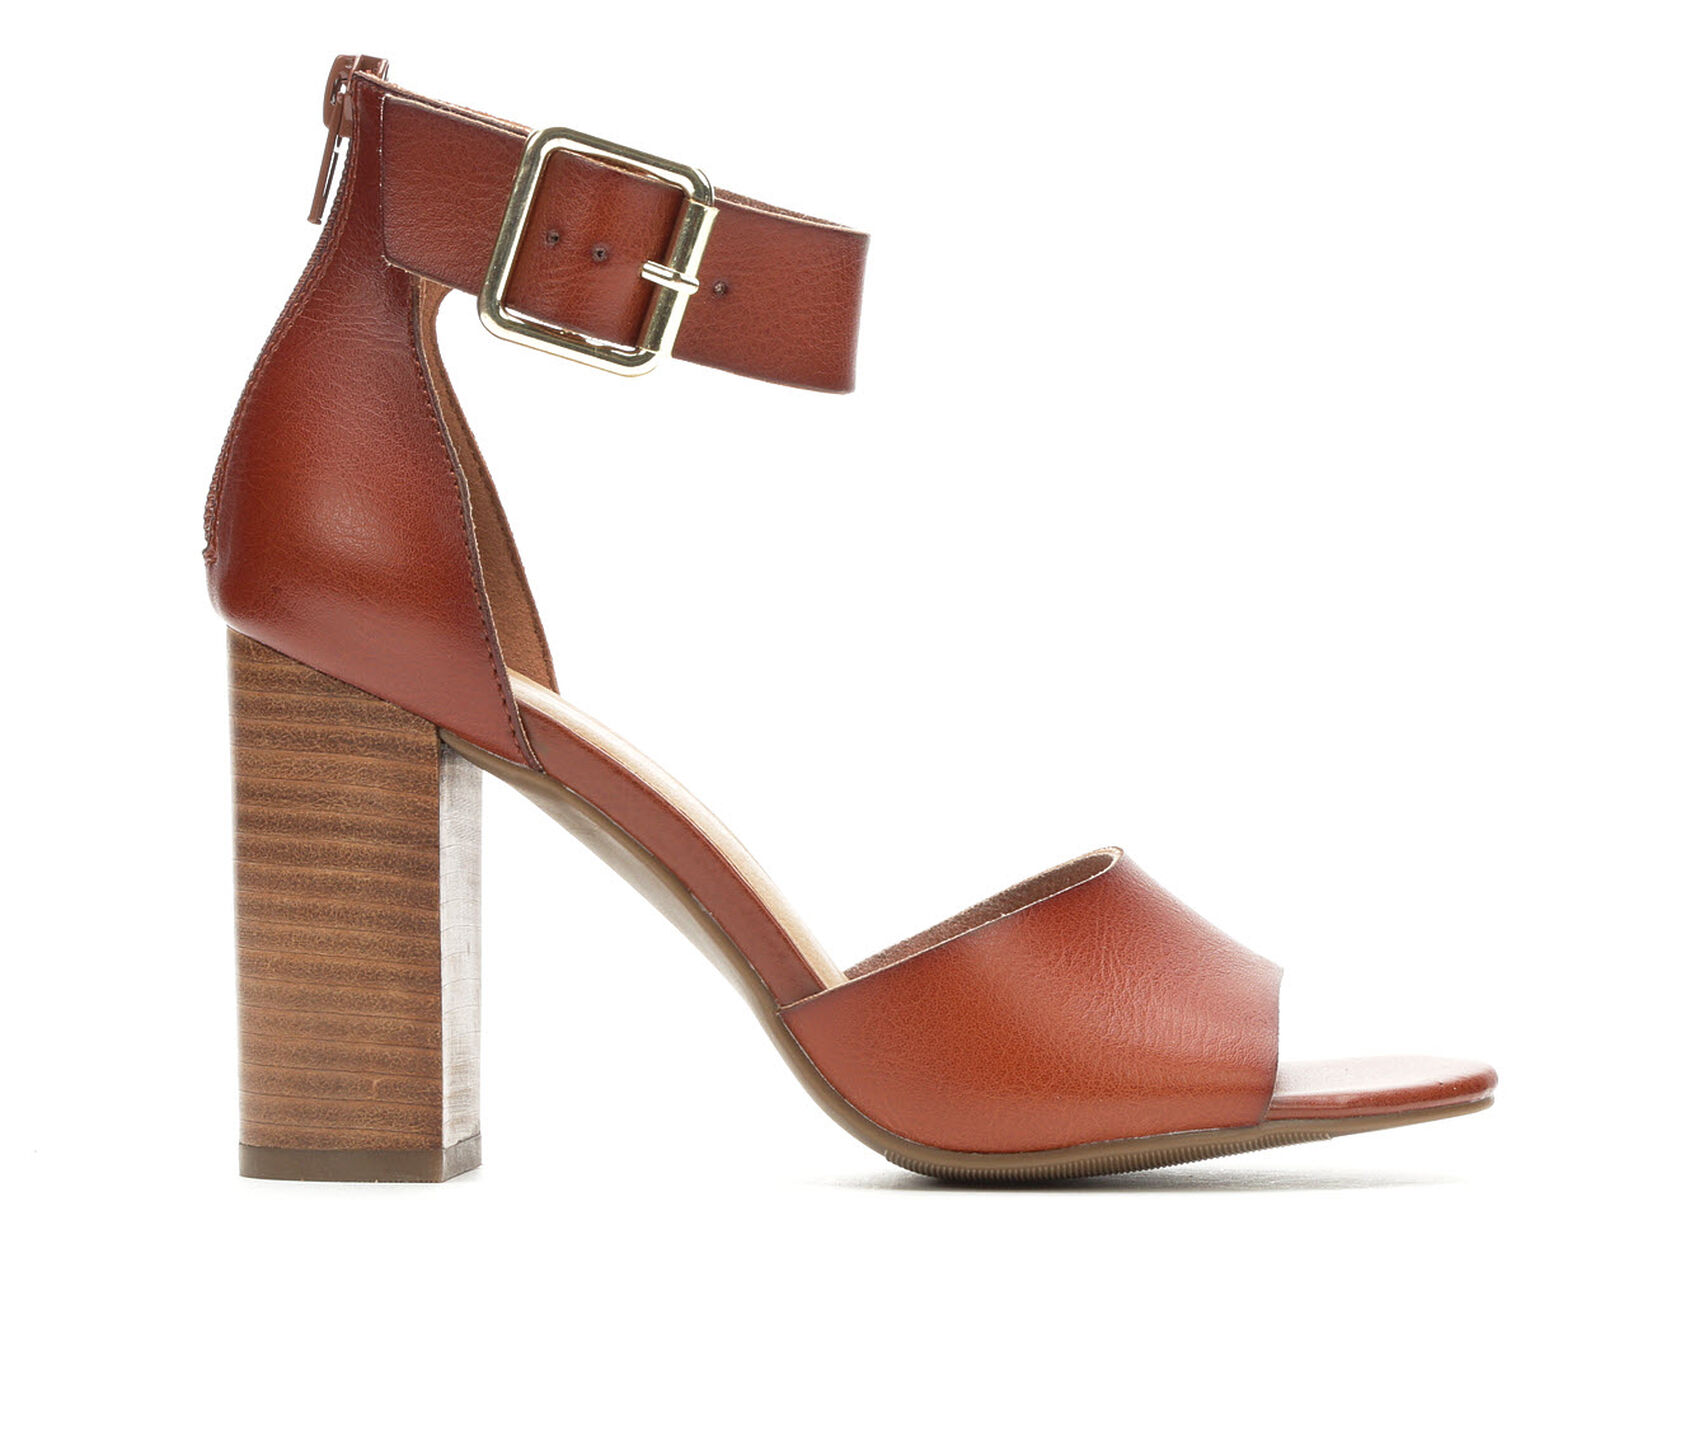 f42702e74e1 Women's Madden Girl Harper Dress Sandals